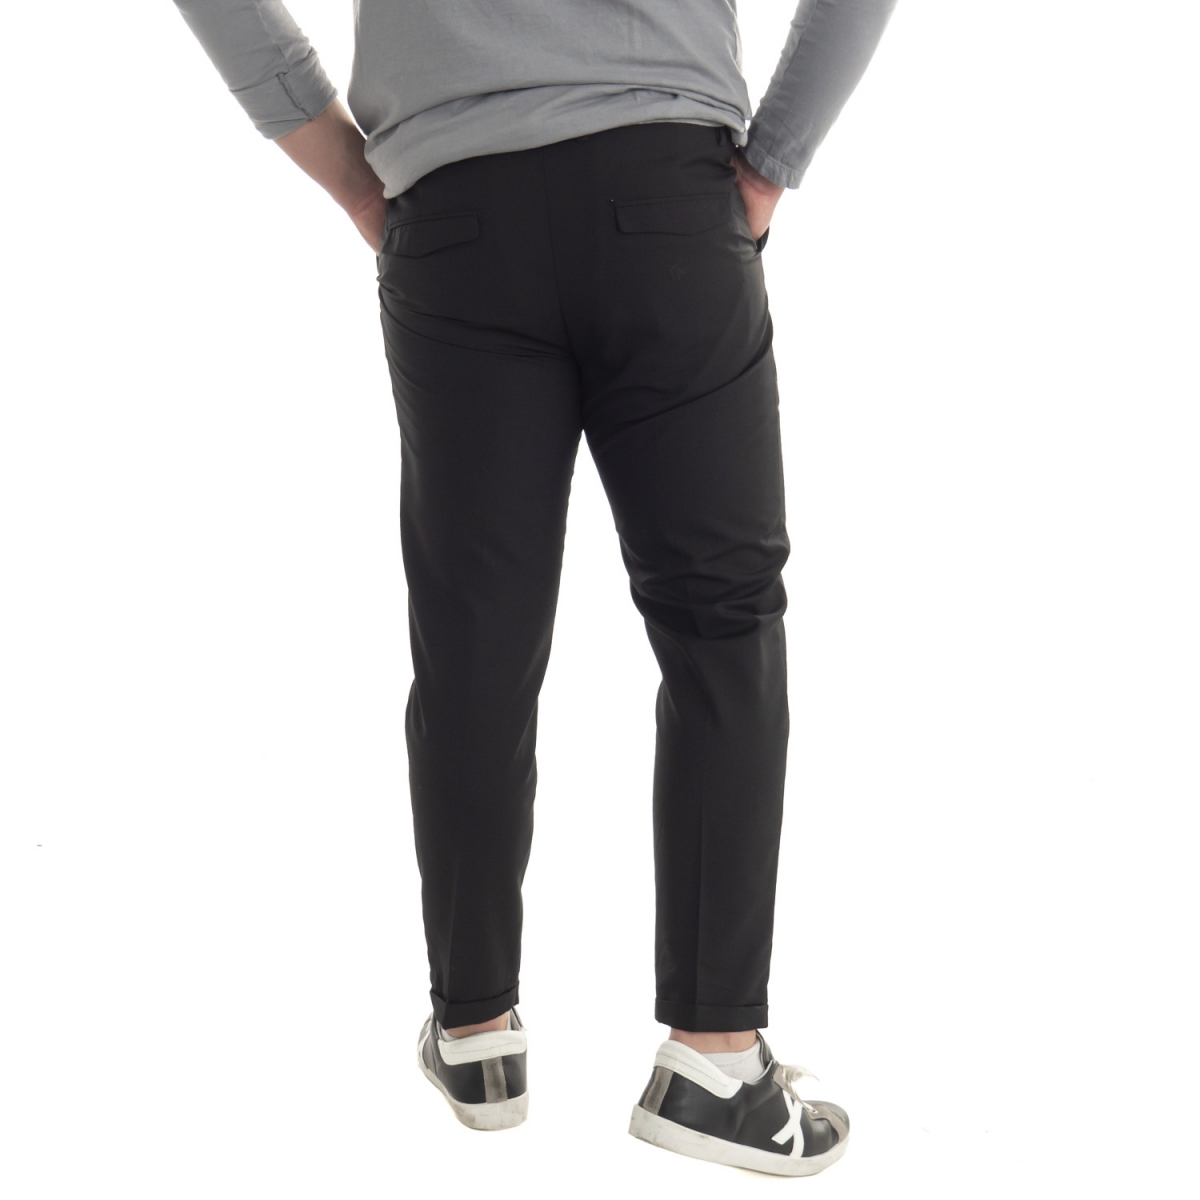 Kleidung Hose mann Pantalone chino LPLK2009 LANDEK PARK Cafedelmar Shop